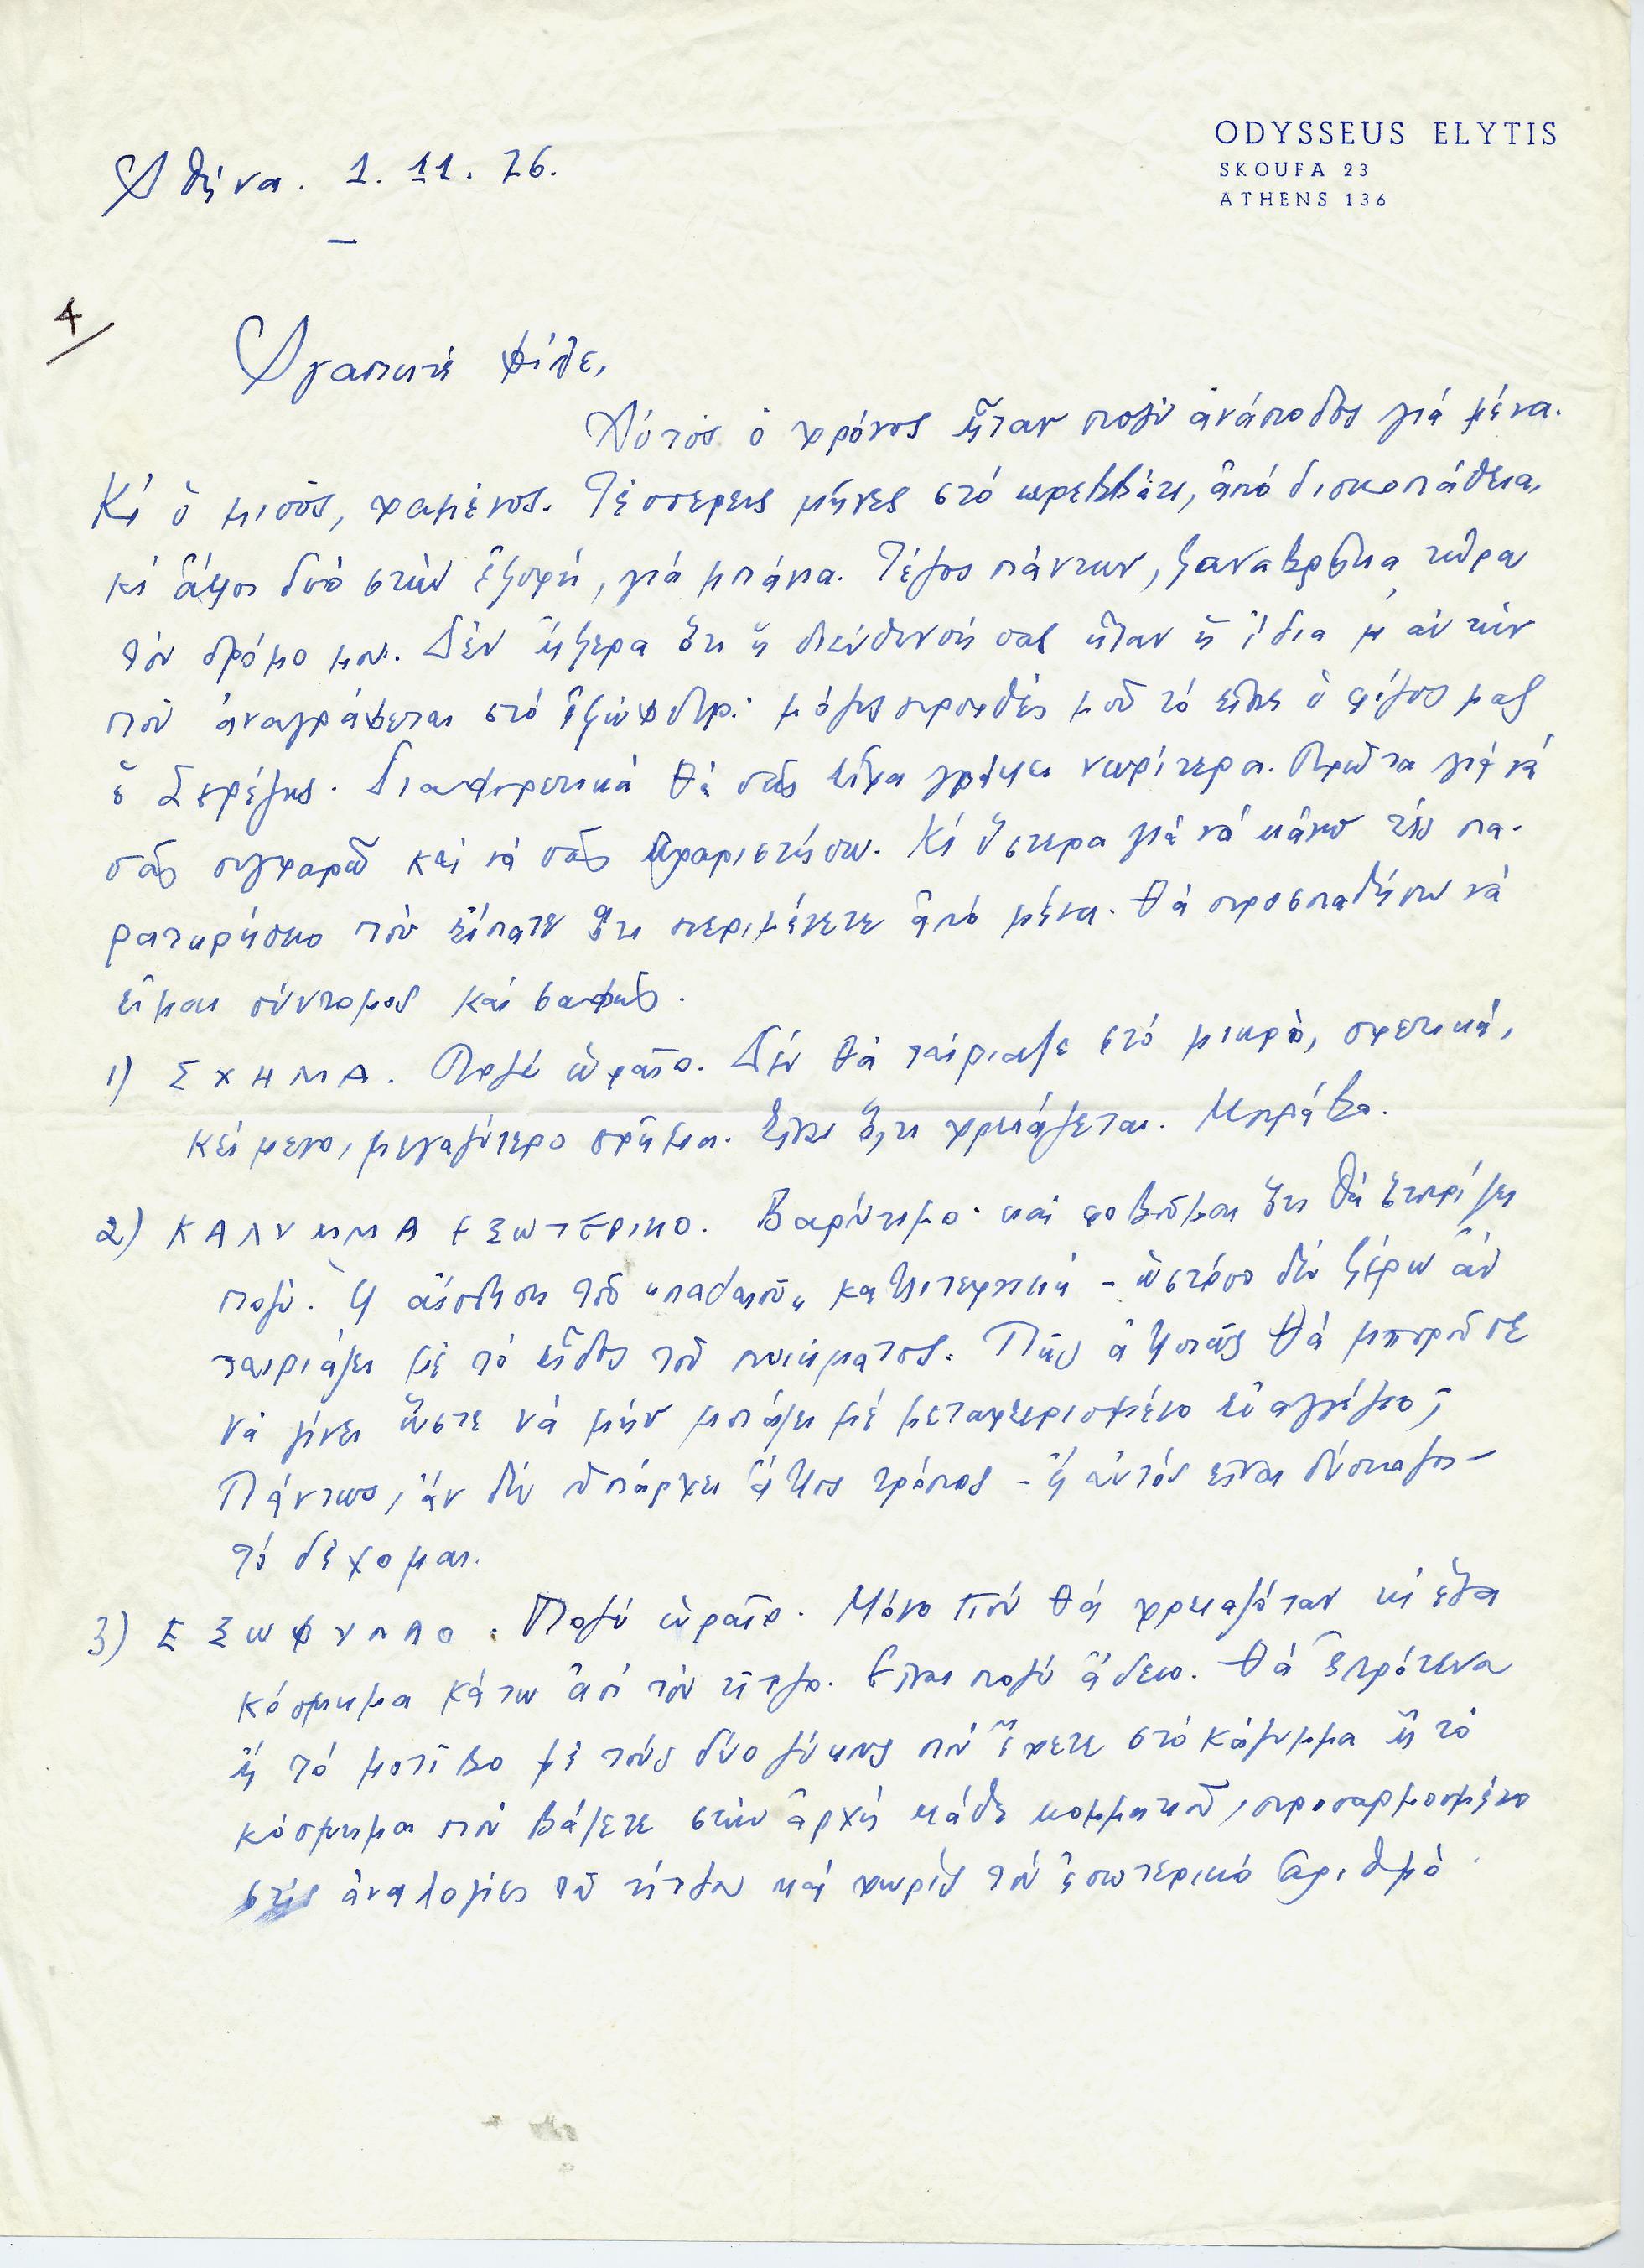 ELYTIS A DIMITRI - 01.11.[19]76 - A